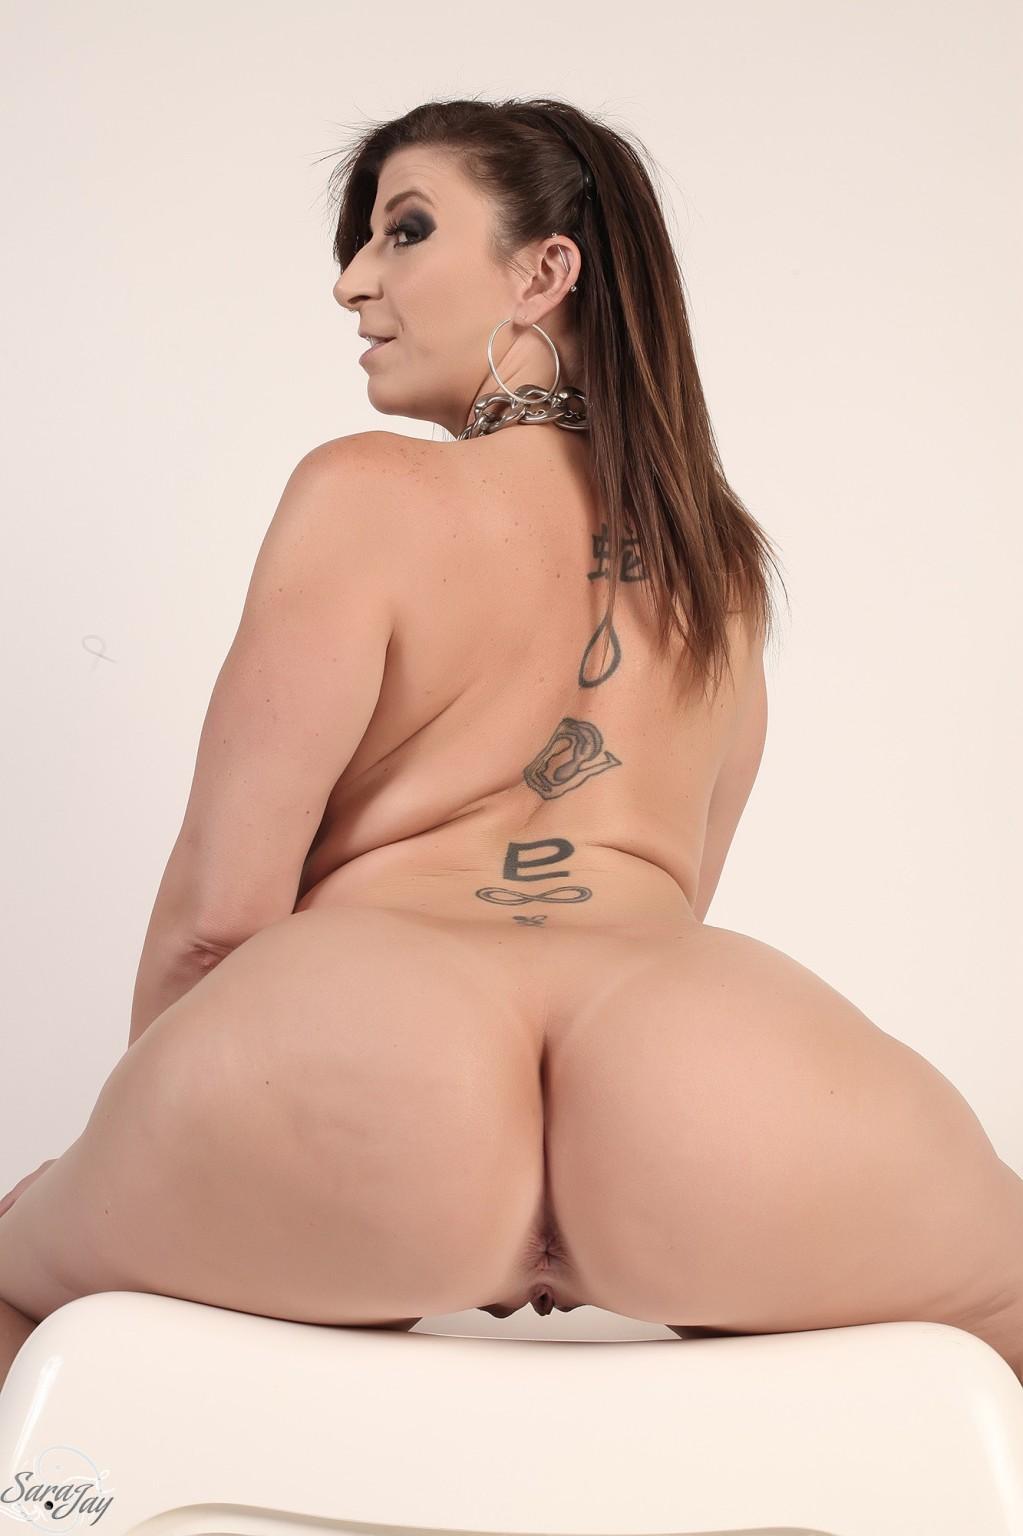 Lick naked girls and guys